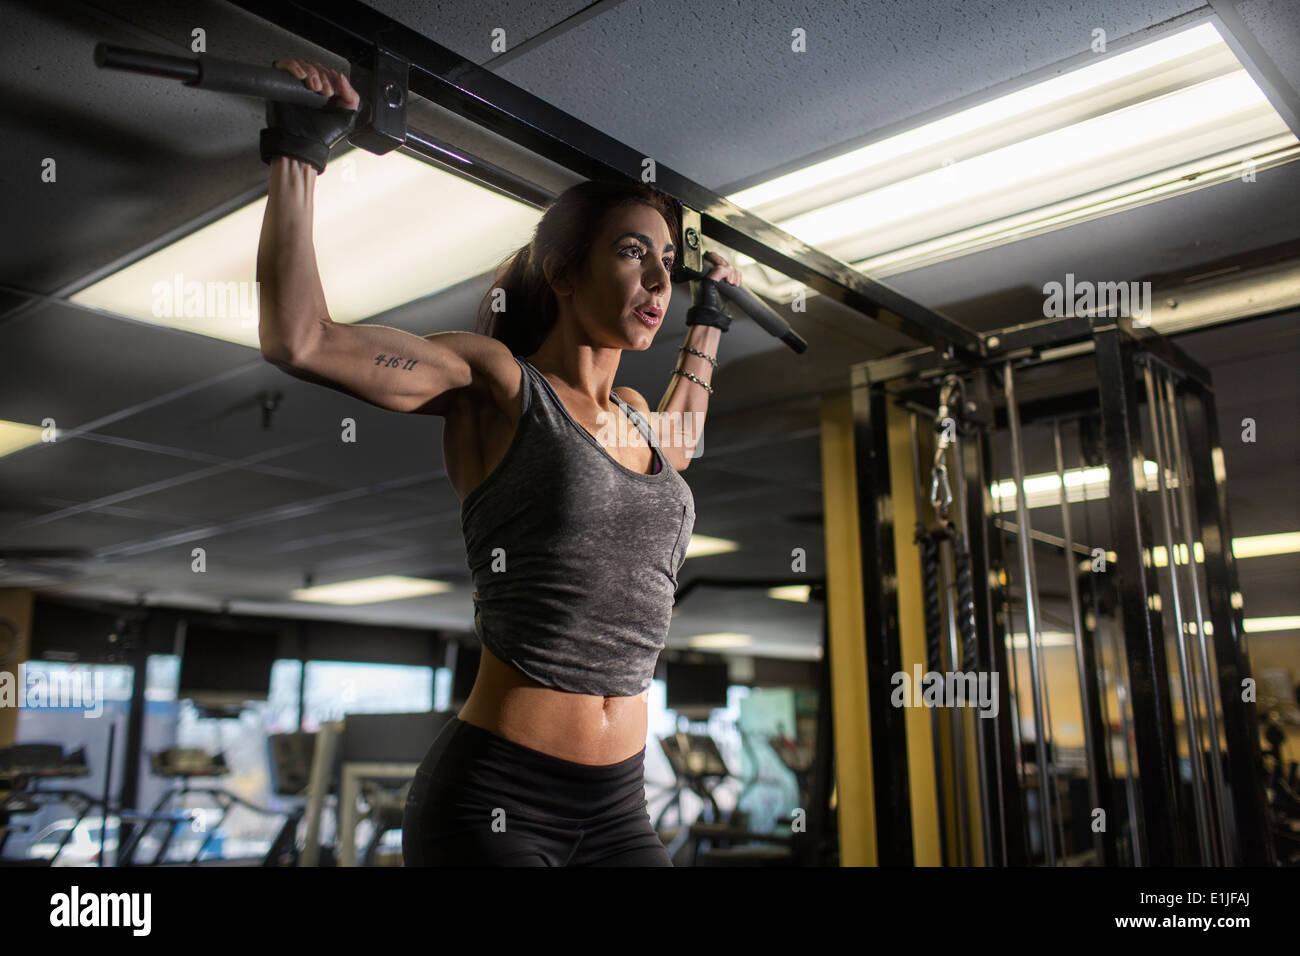 Mitte Erwachsene Frau Brust trainieren im Fitness-Studio Stockbild